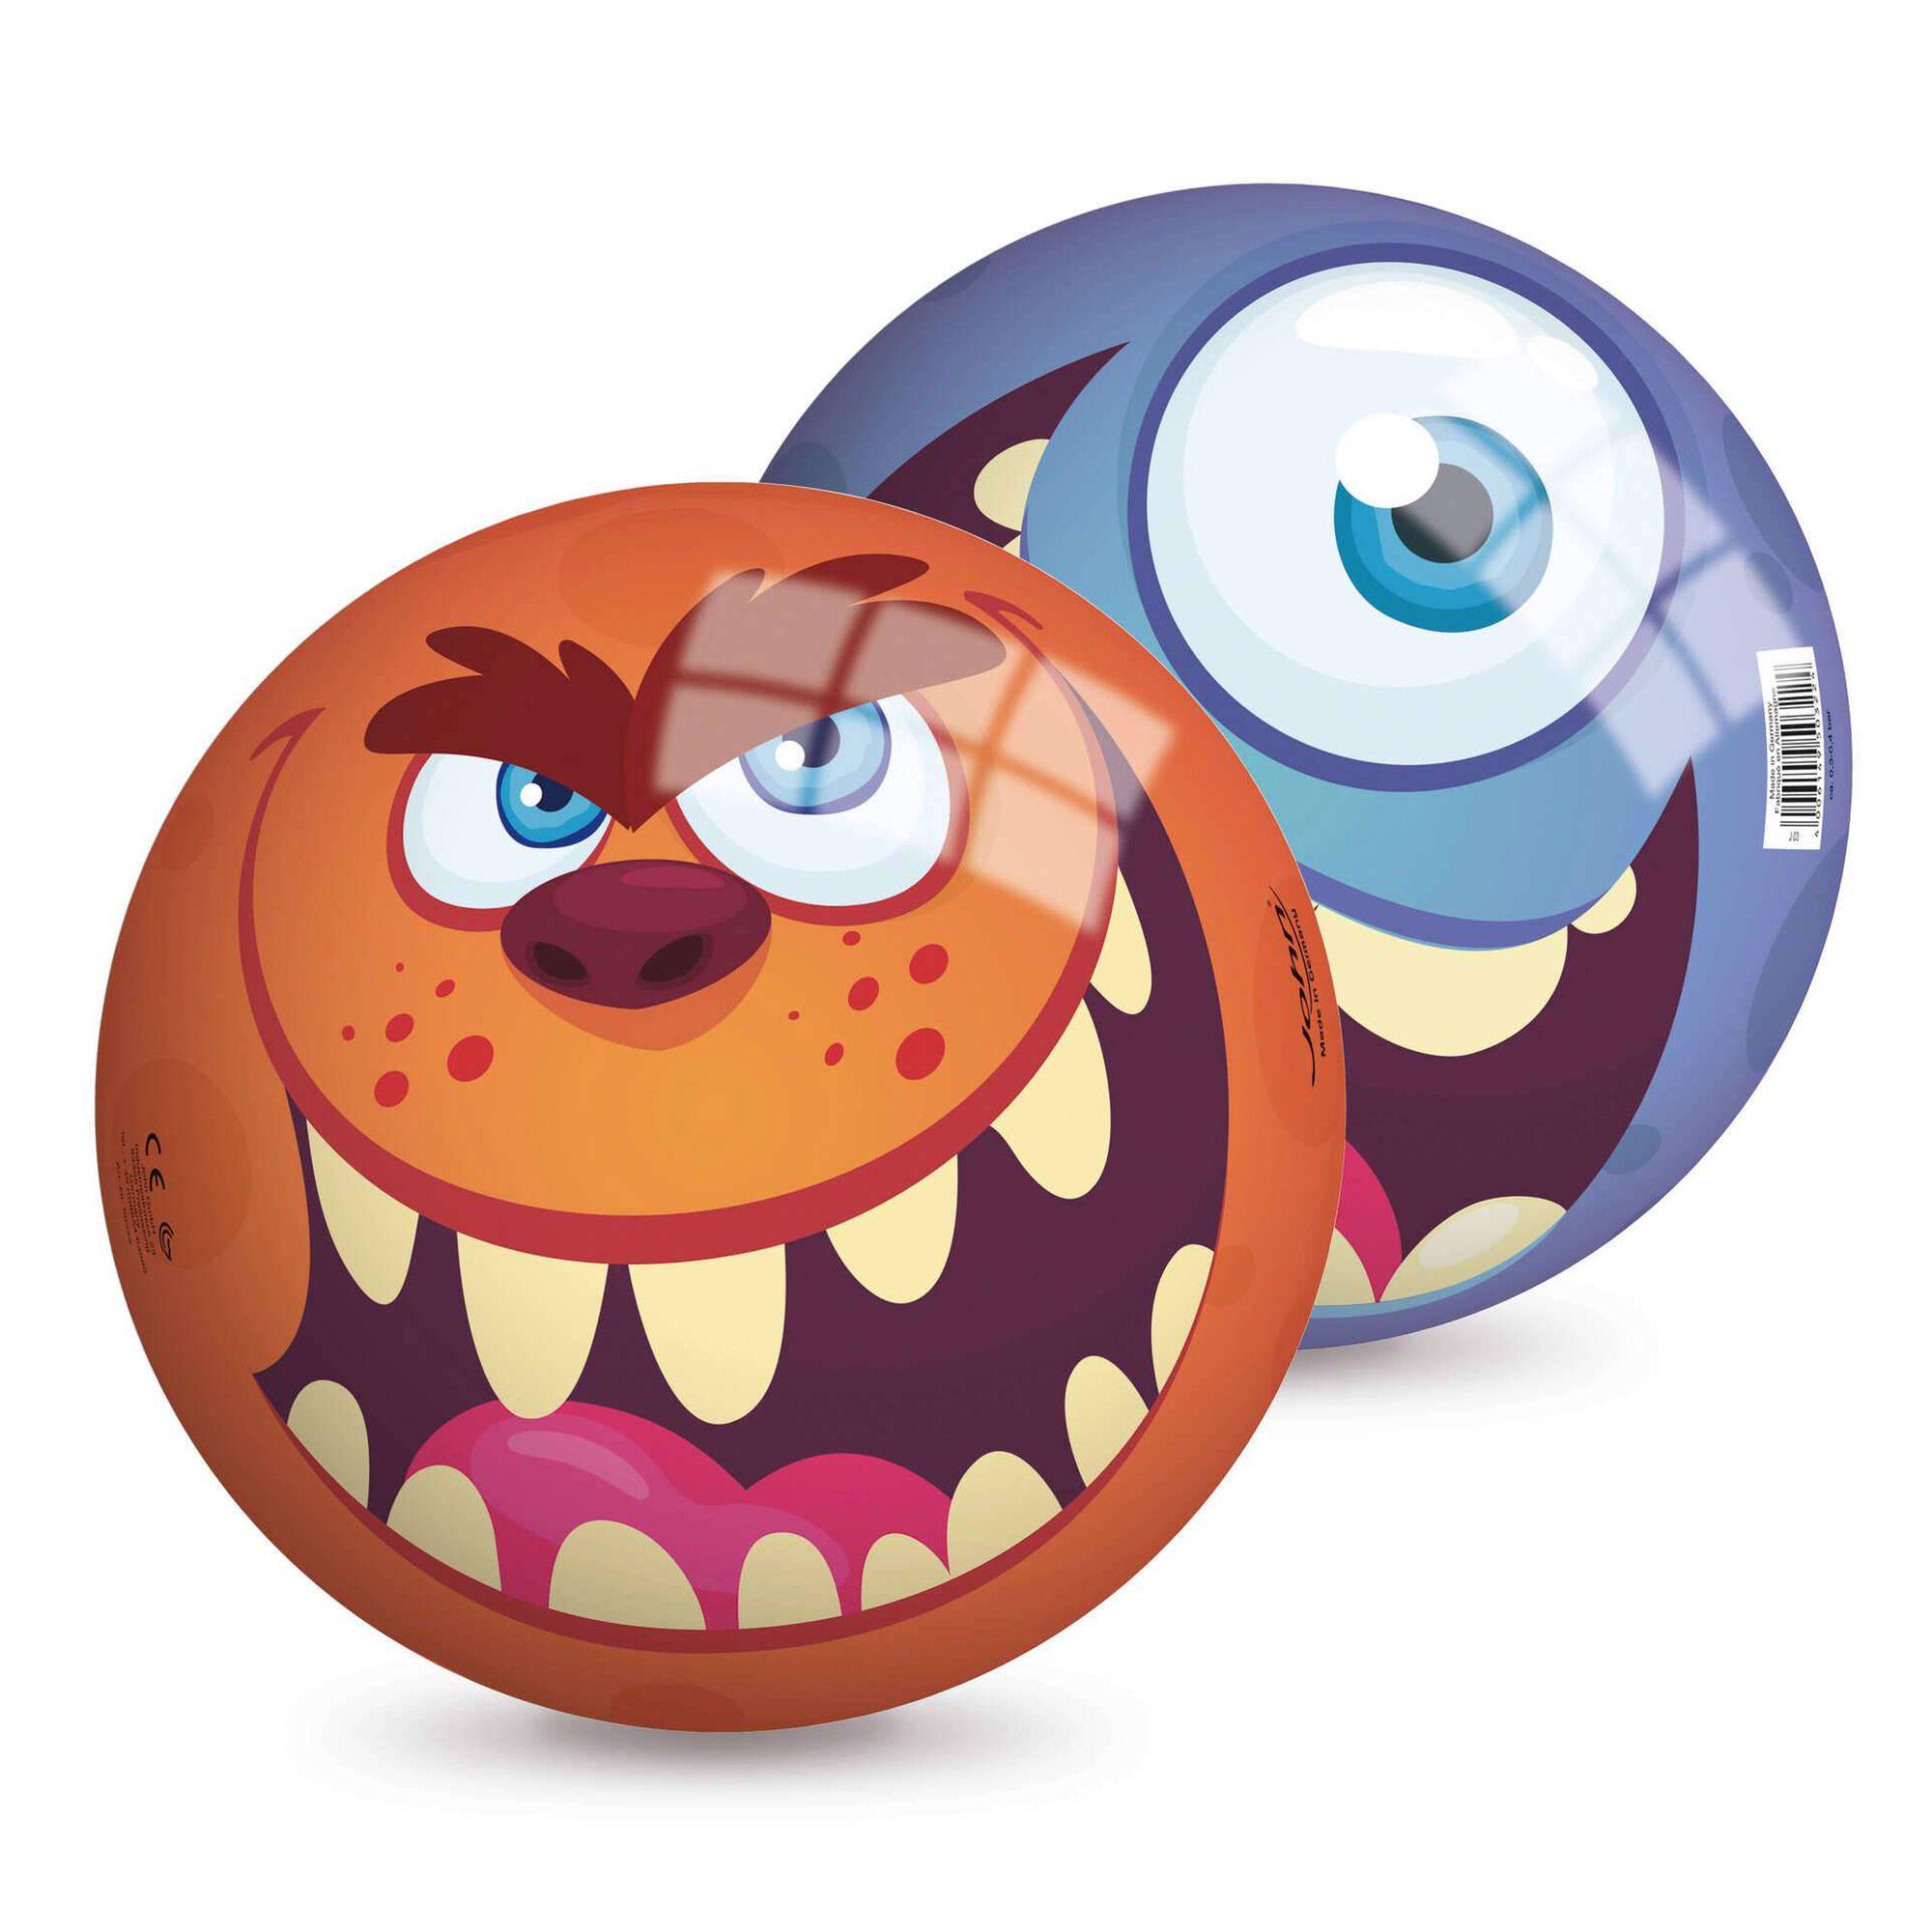 Bola Little Monsters (vários modelos)